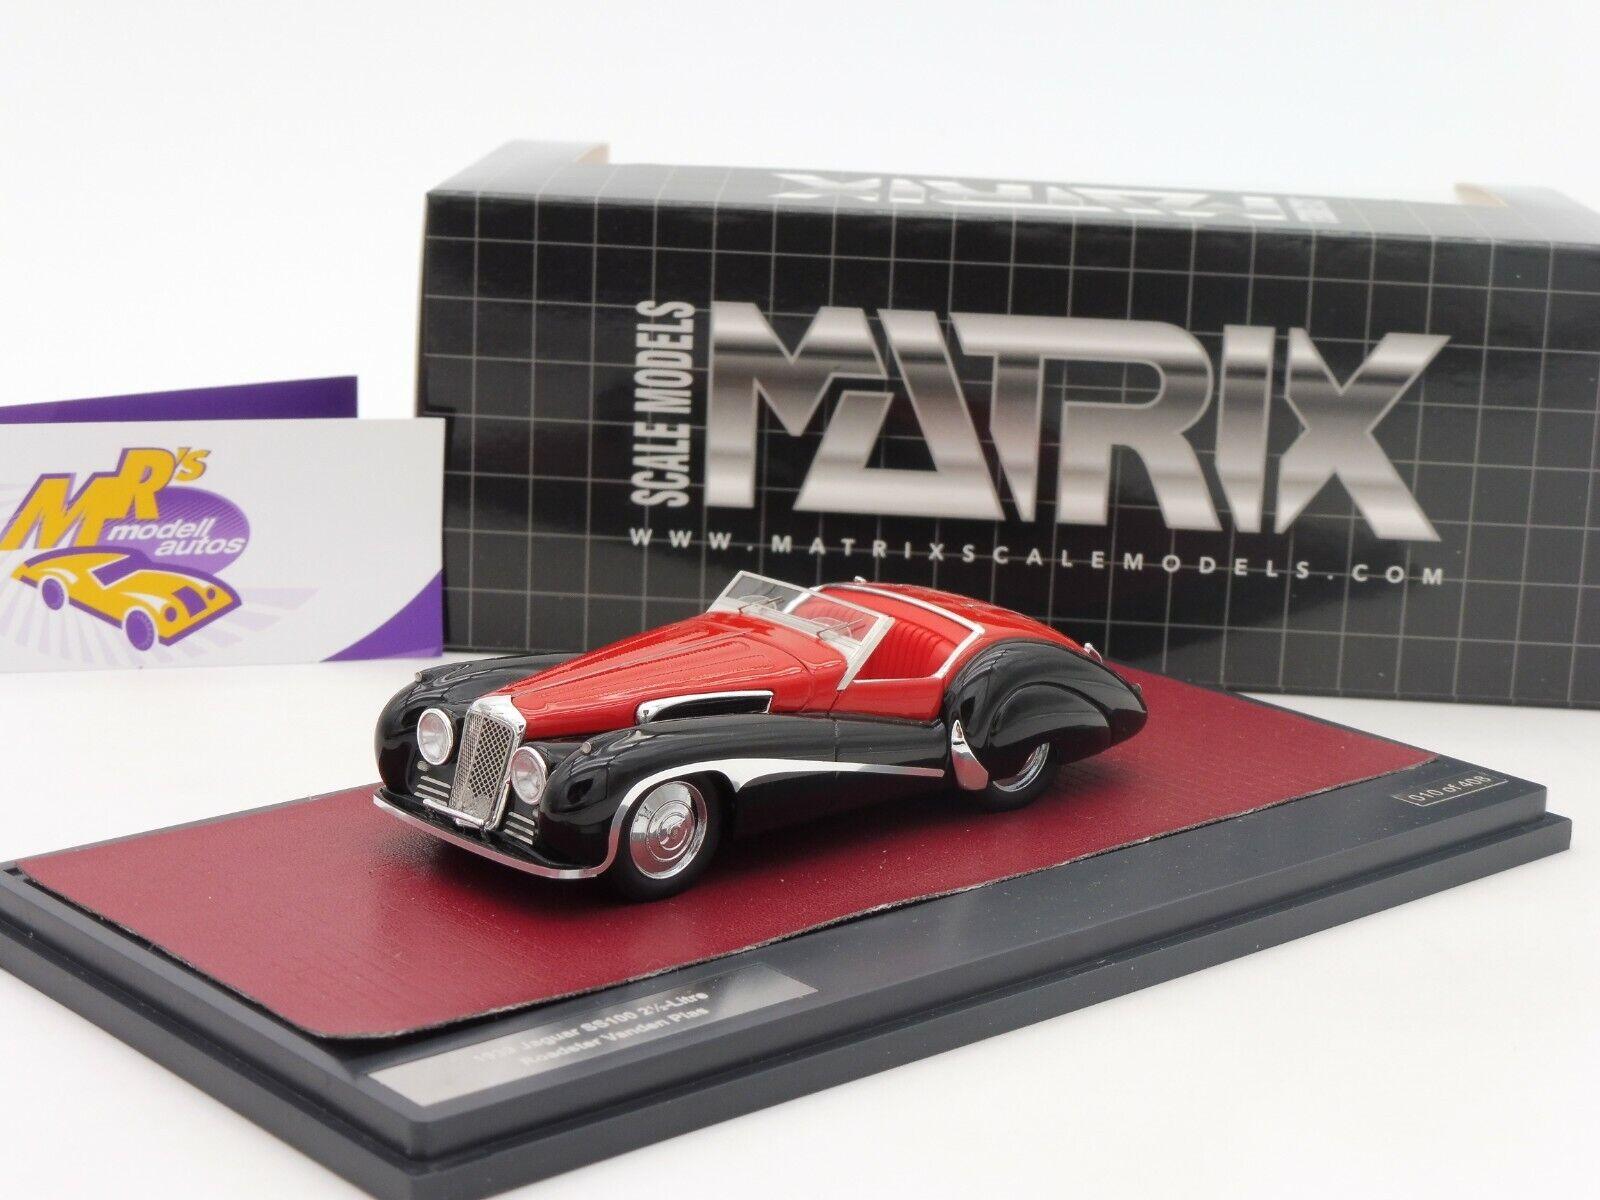 Matrix 41001-131   Jaguar SS100 2 1 2 Litre Vanden Plas Bj.1939 red-black 1 43